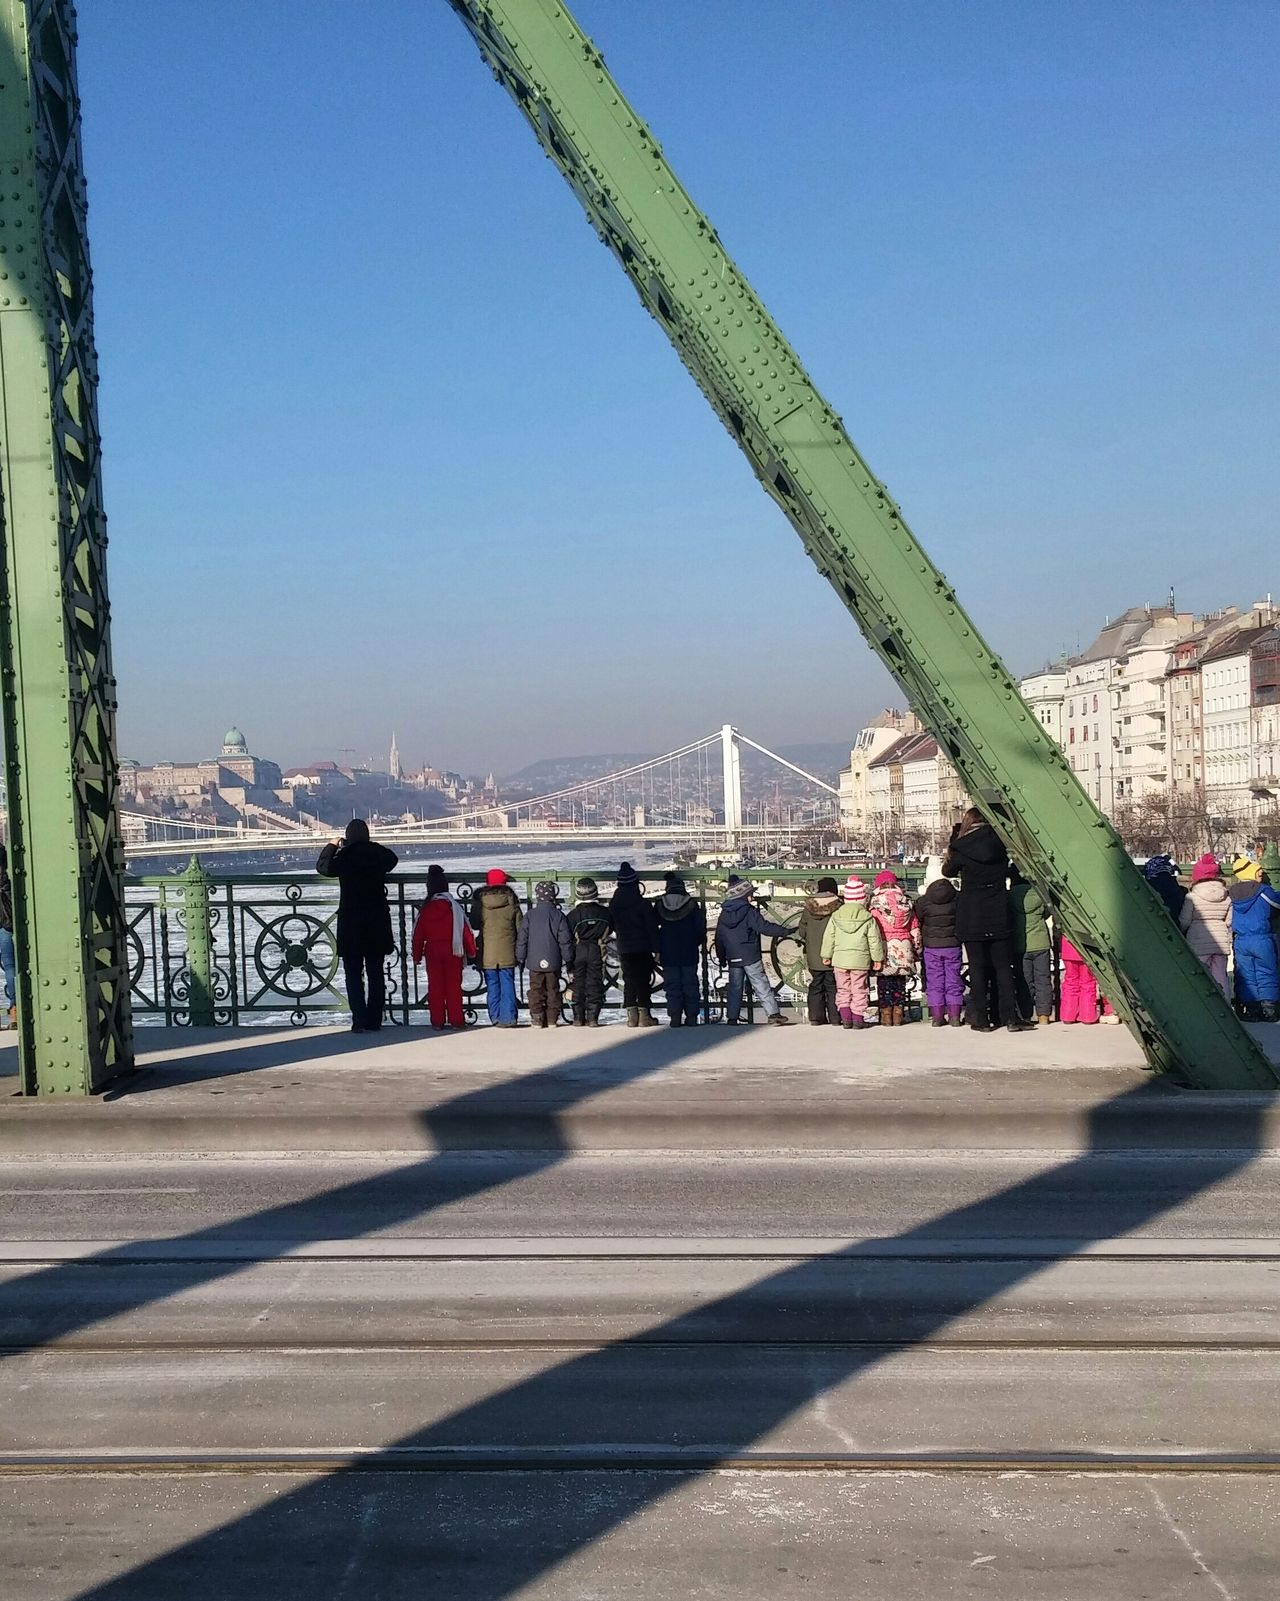 Budapest Budapest Streetphotography Budapestgram Streetlife Streetphotography Bridge Children Debacle Ice